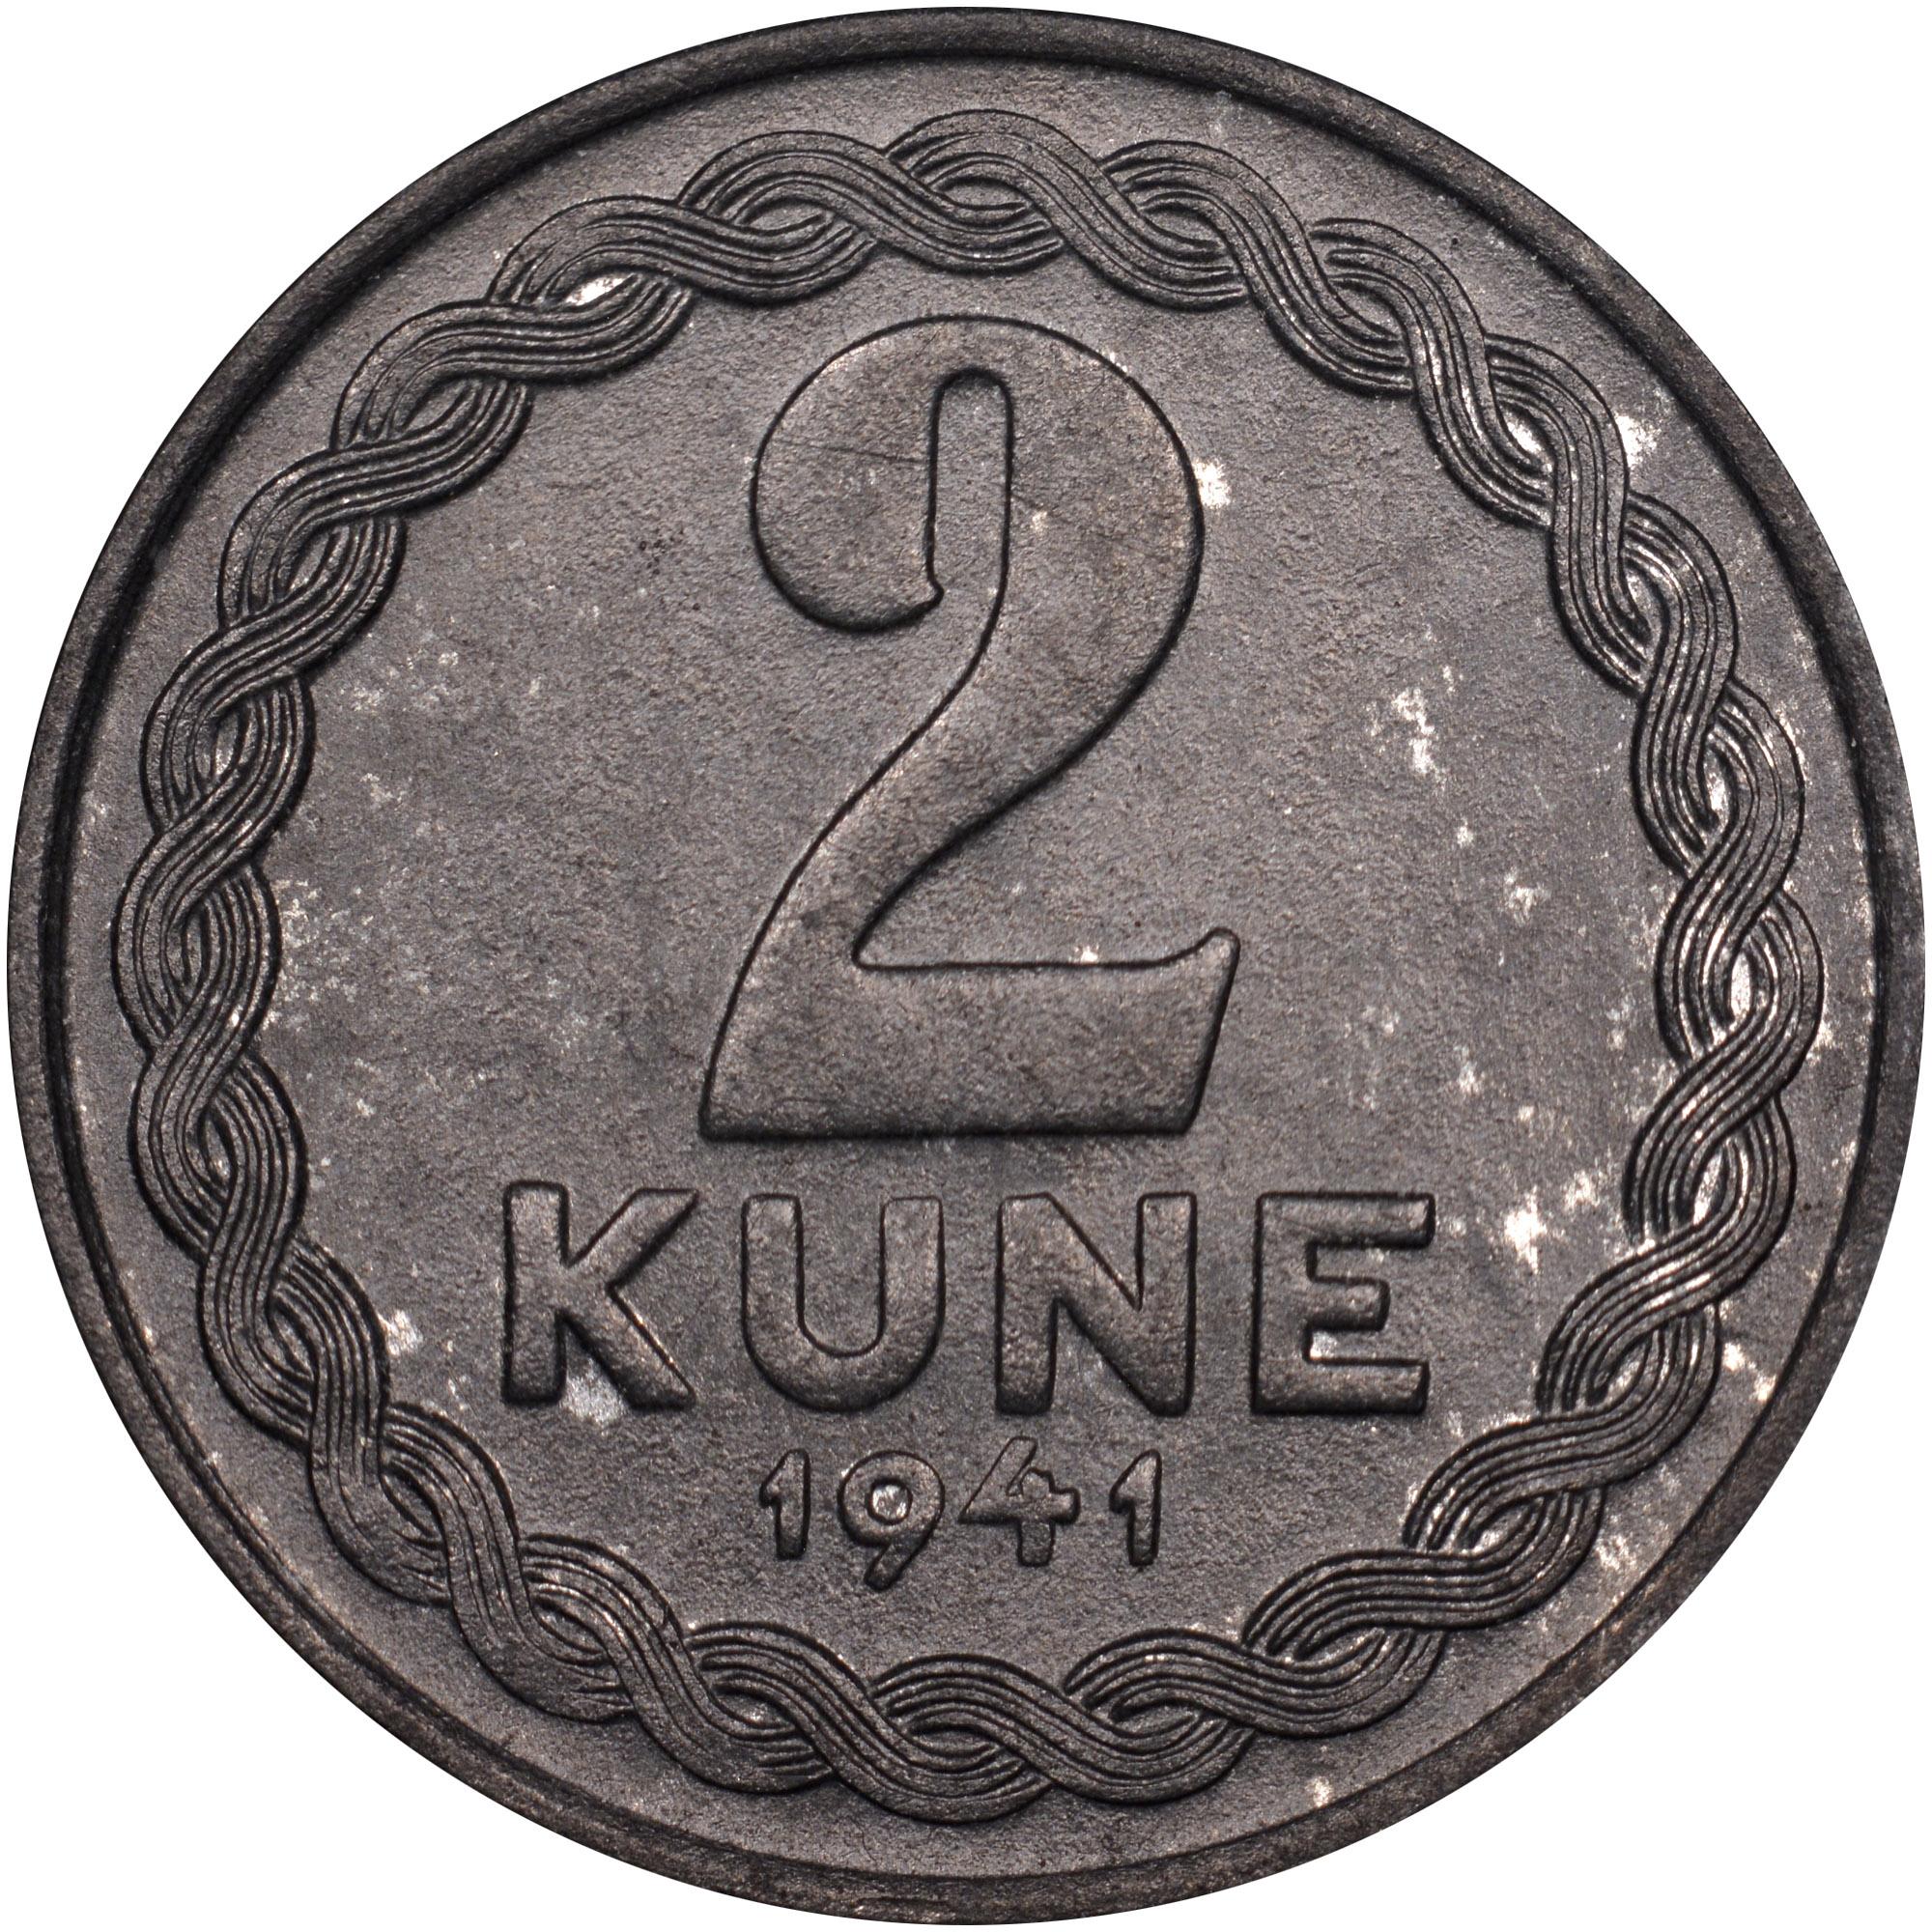 1941 Croatia 2 Kune reverse